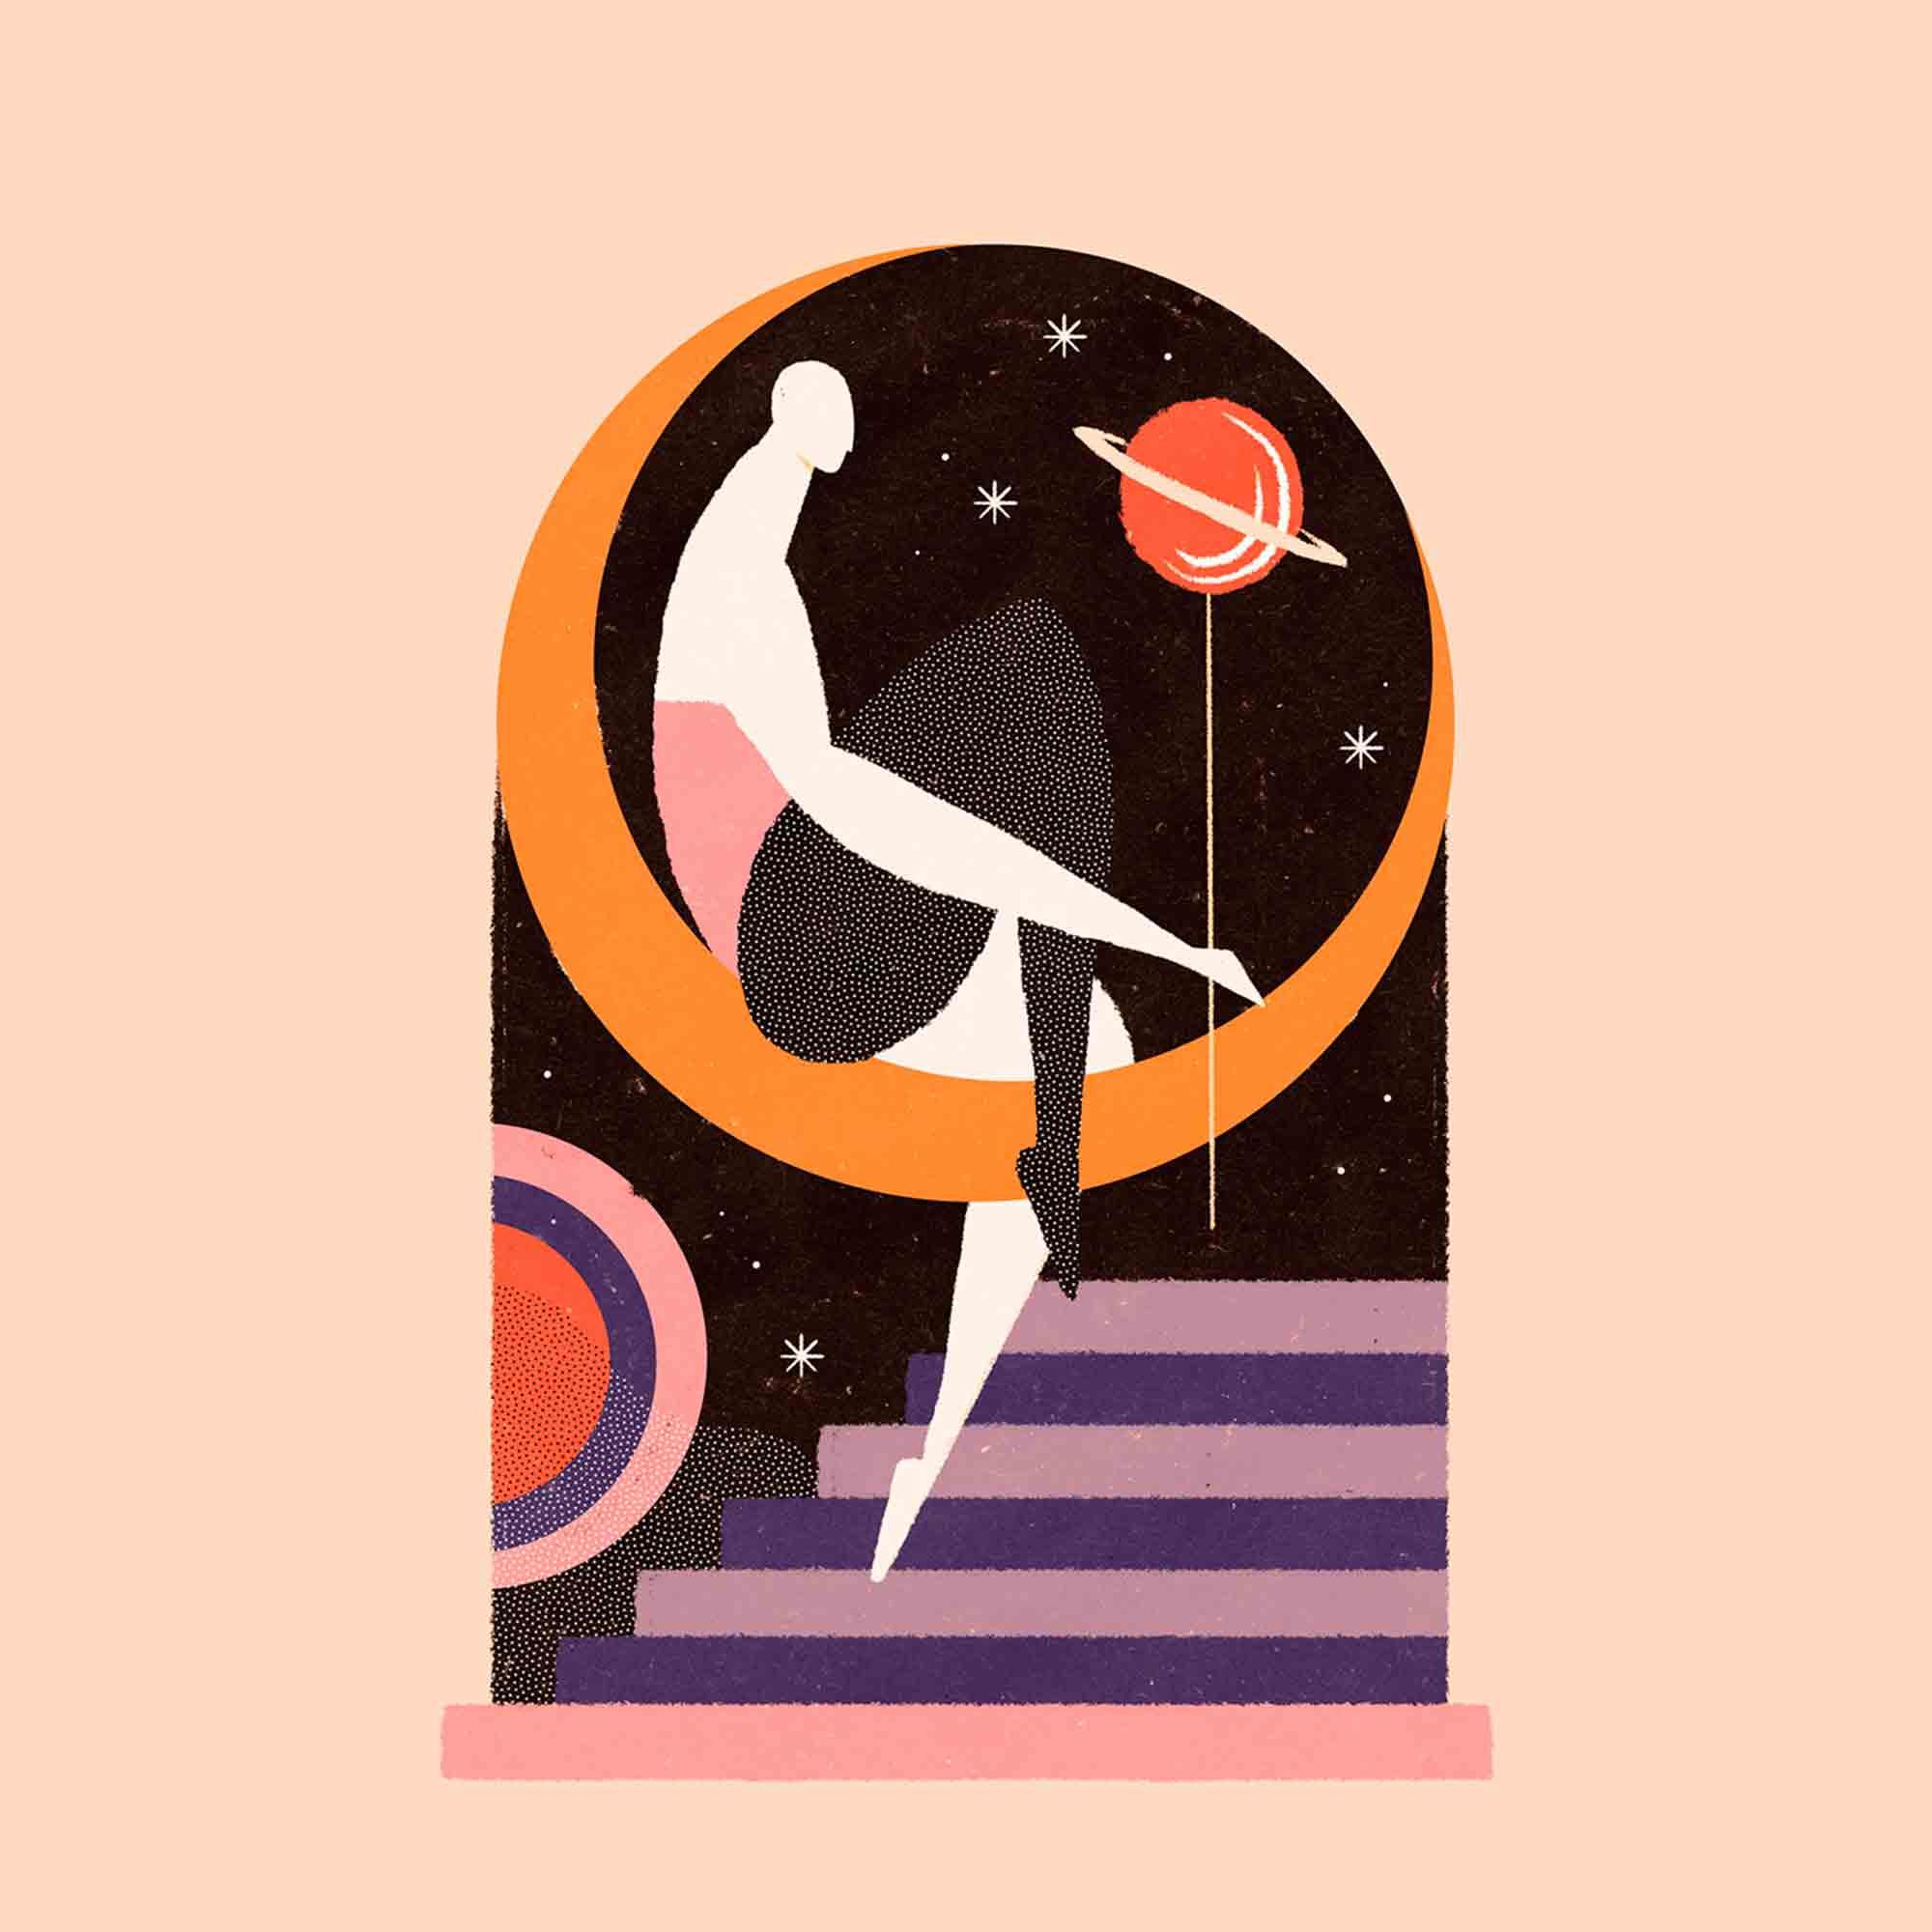 diseño grafico valencia ilustracion